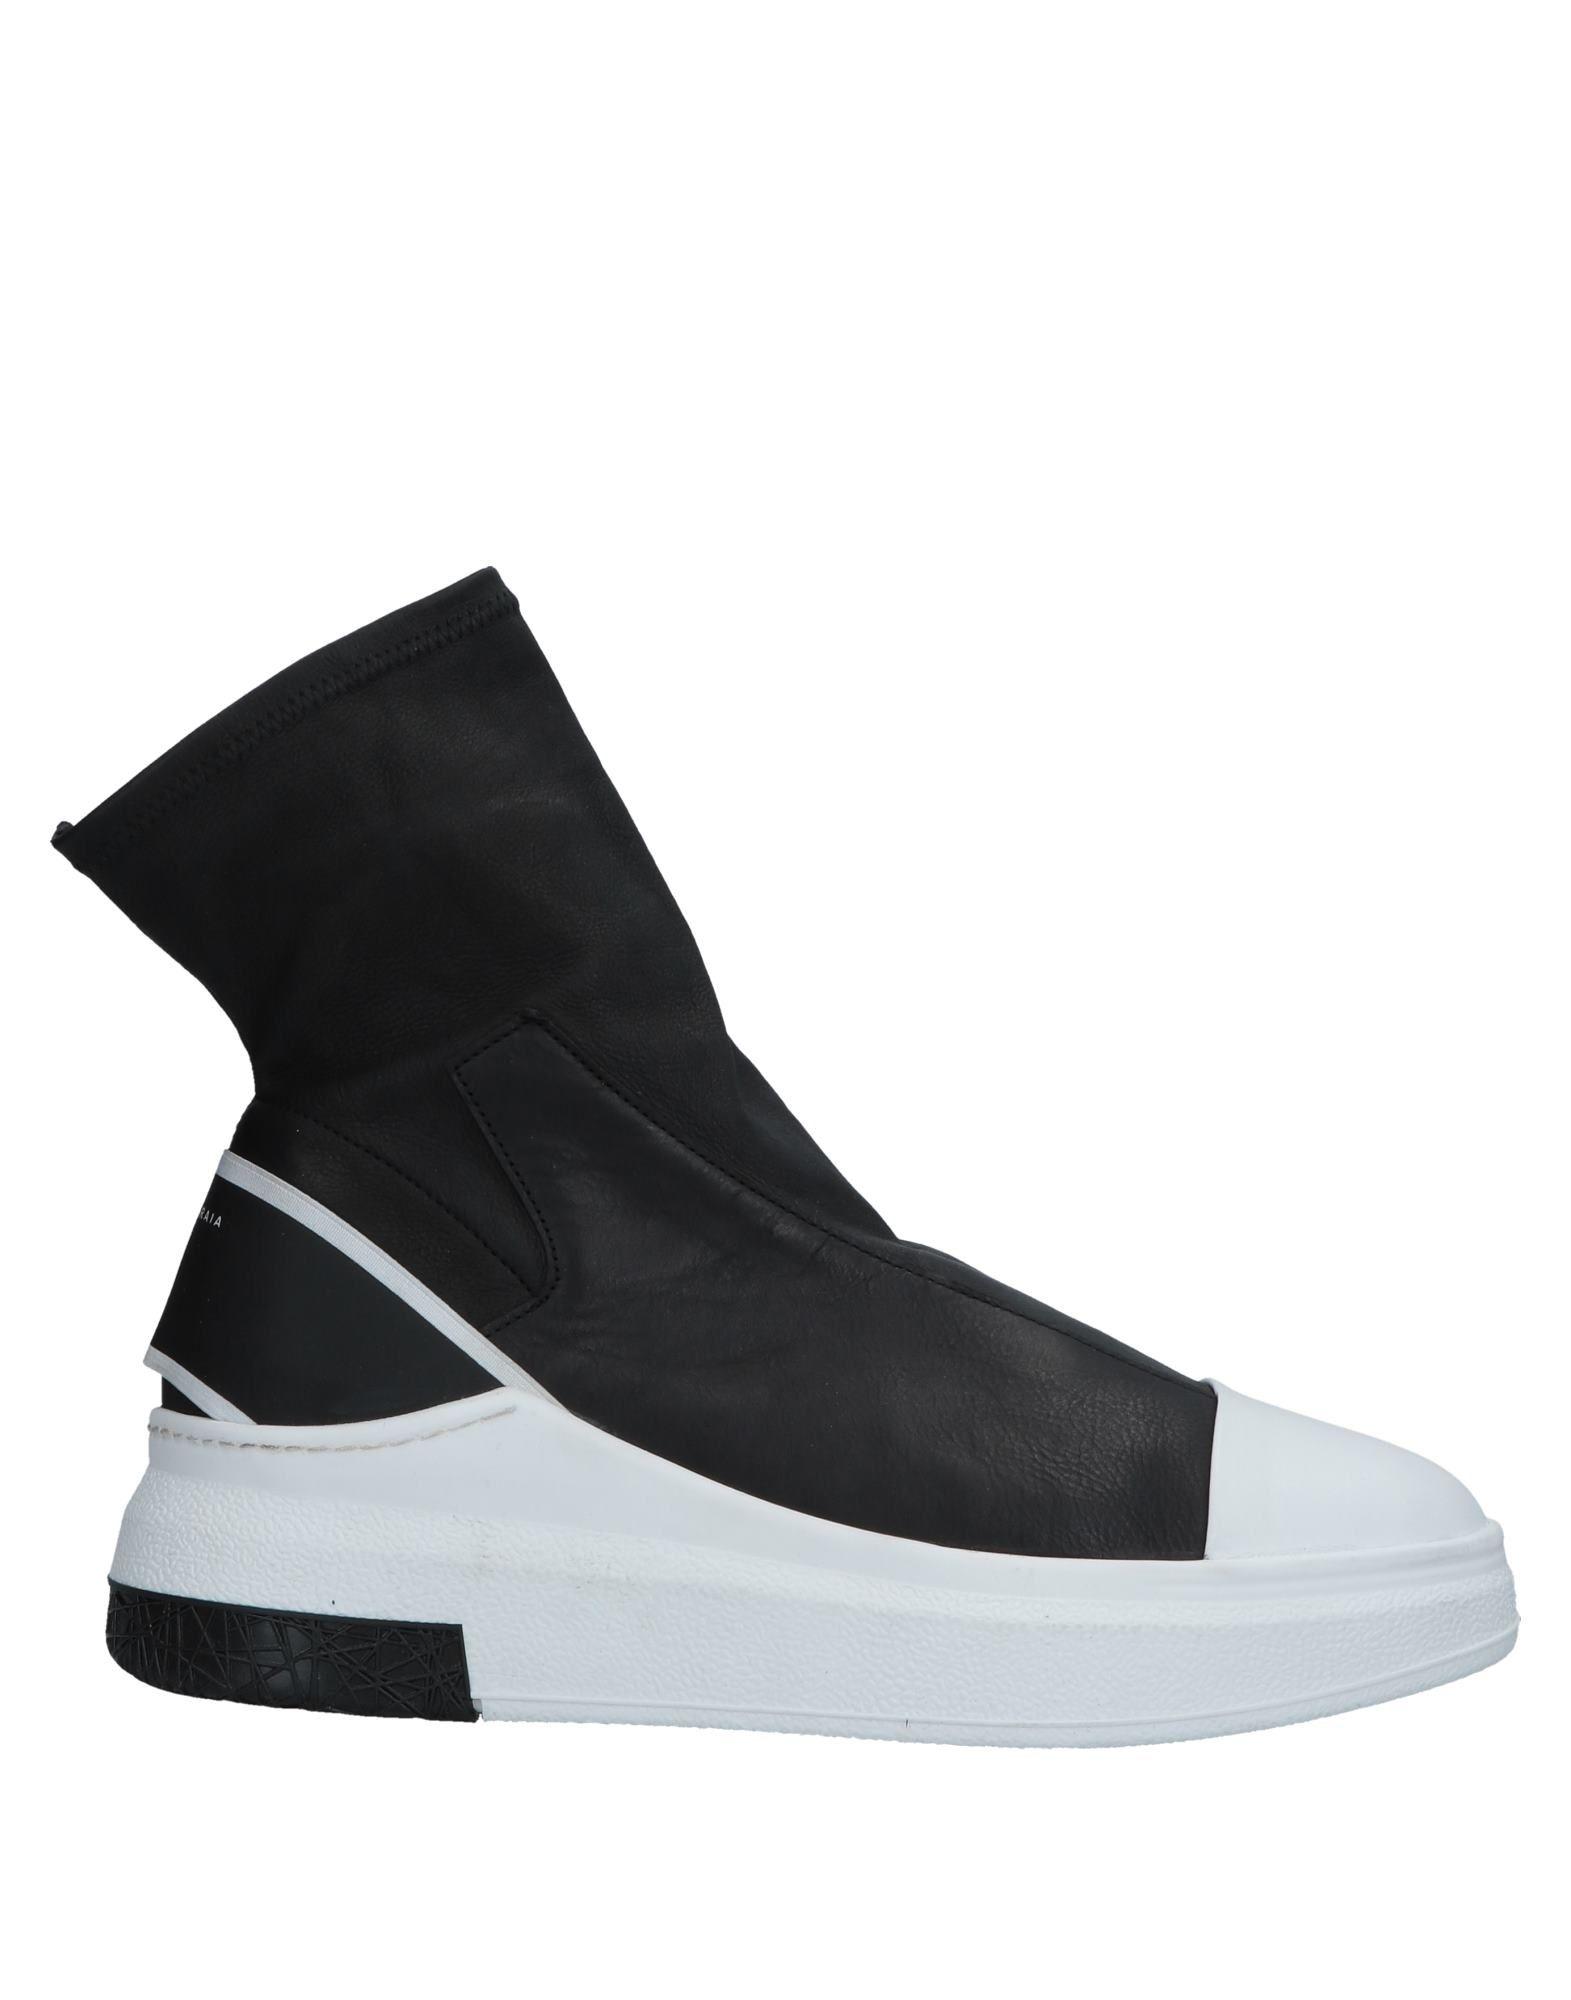 Cinzia Araia Ankle Boot Boot Boot - Women Cinzia Araia Ankle Boots online on  United Kingdom - 11573679UE 9e13a9